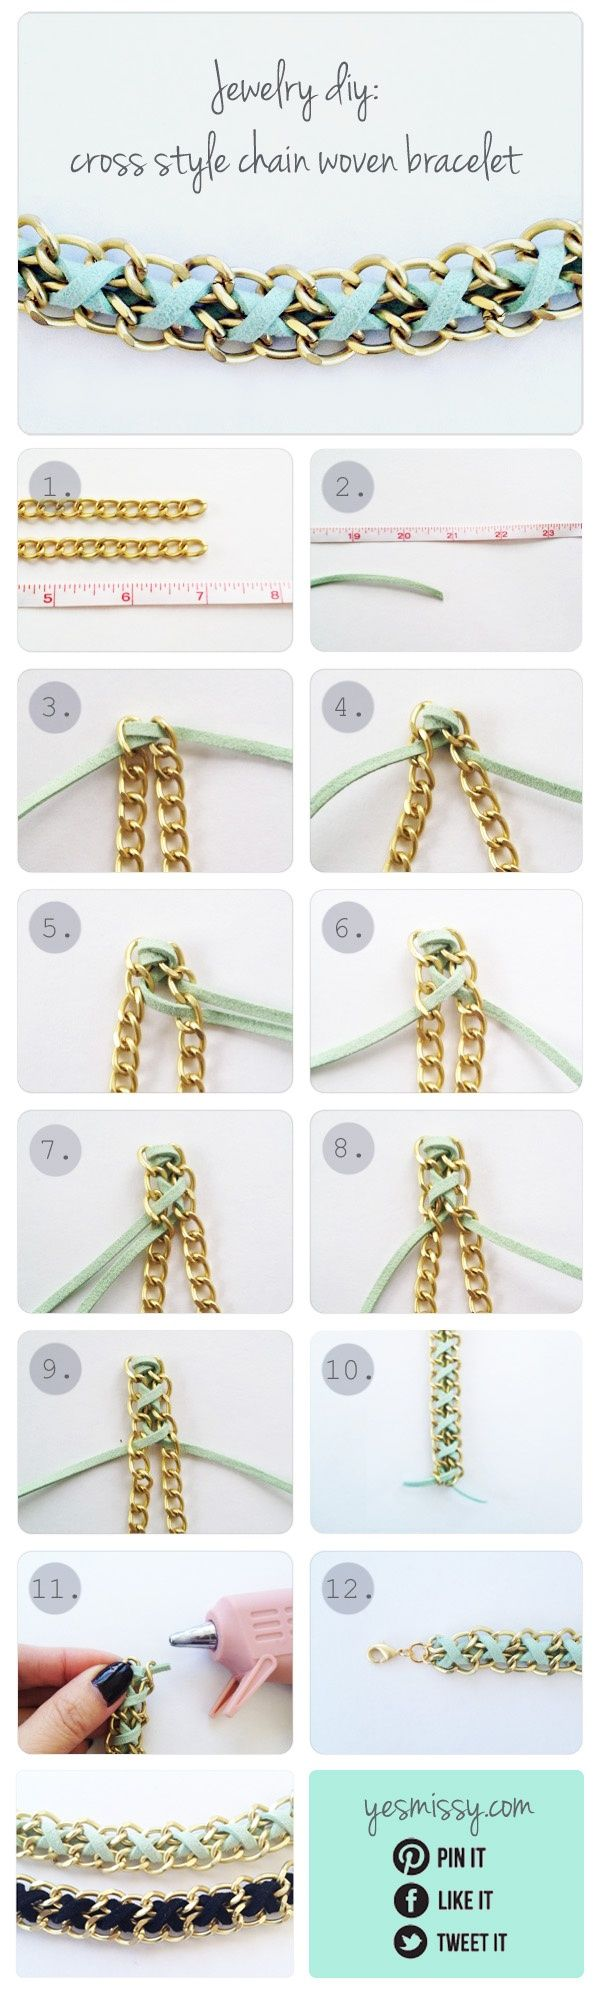 DIY Bracelet  Tutorial for chain and suede bracelet  elfsacks